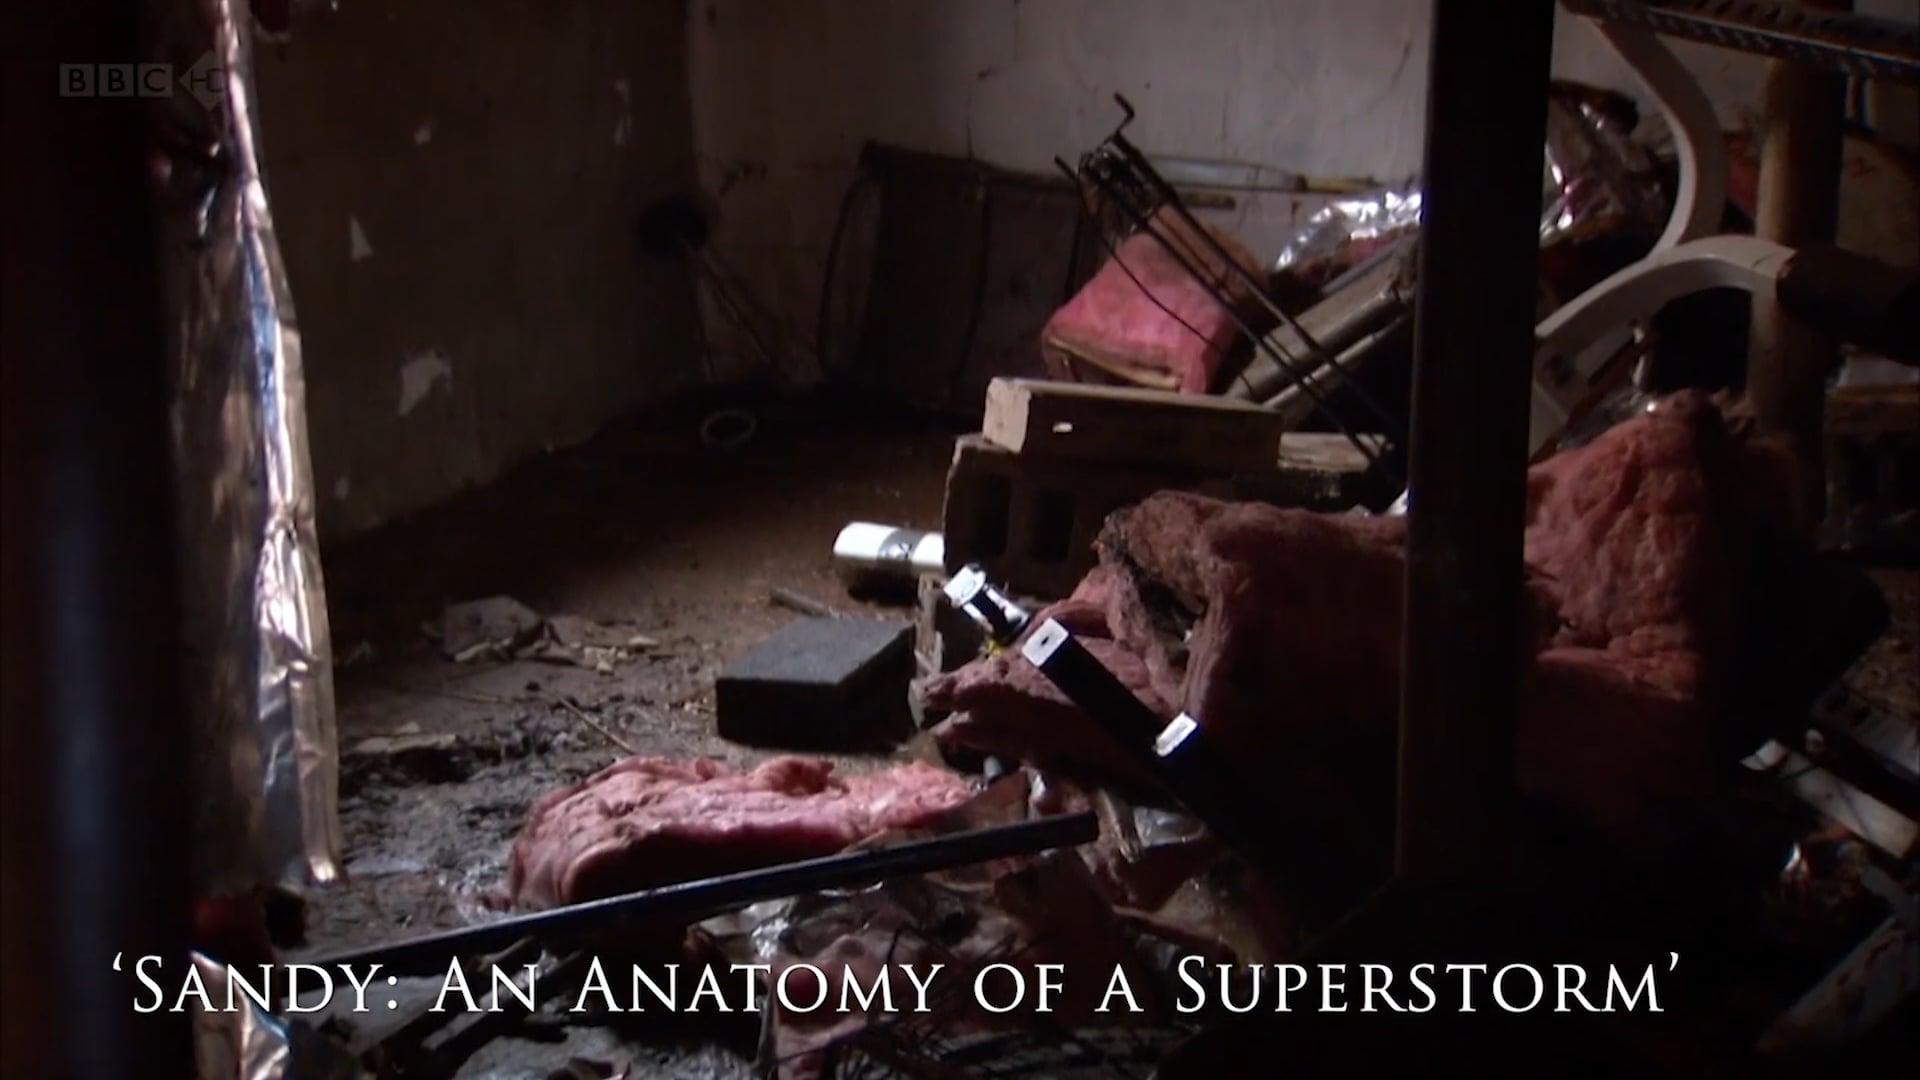 Sandy- Anatomy of a Superstorm PBS-Nova, BBC